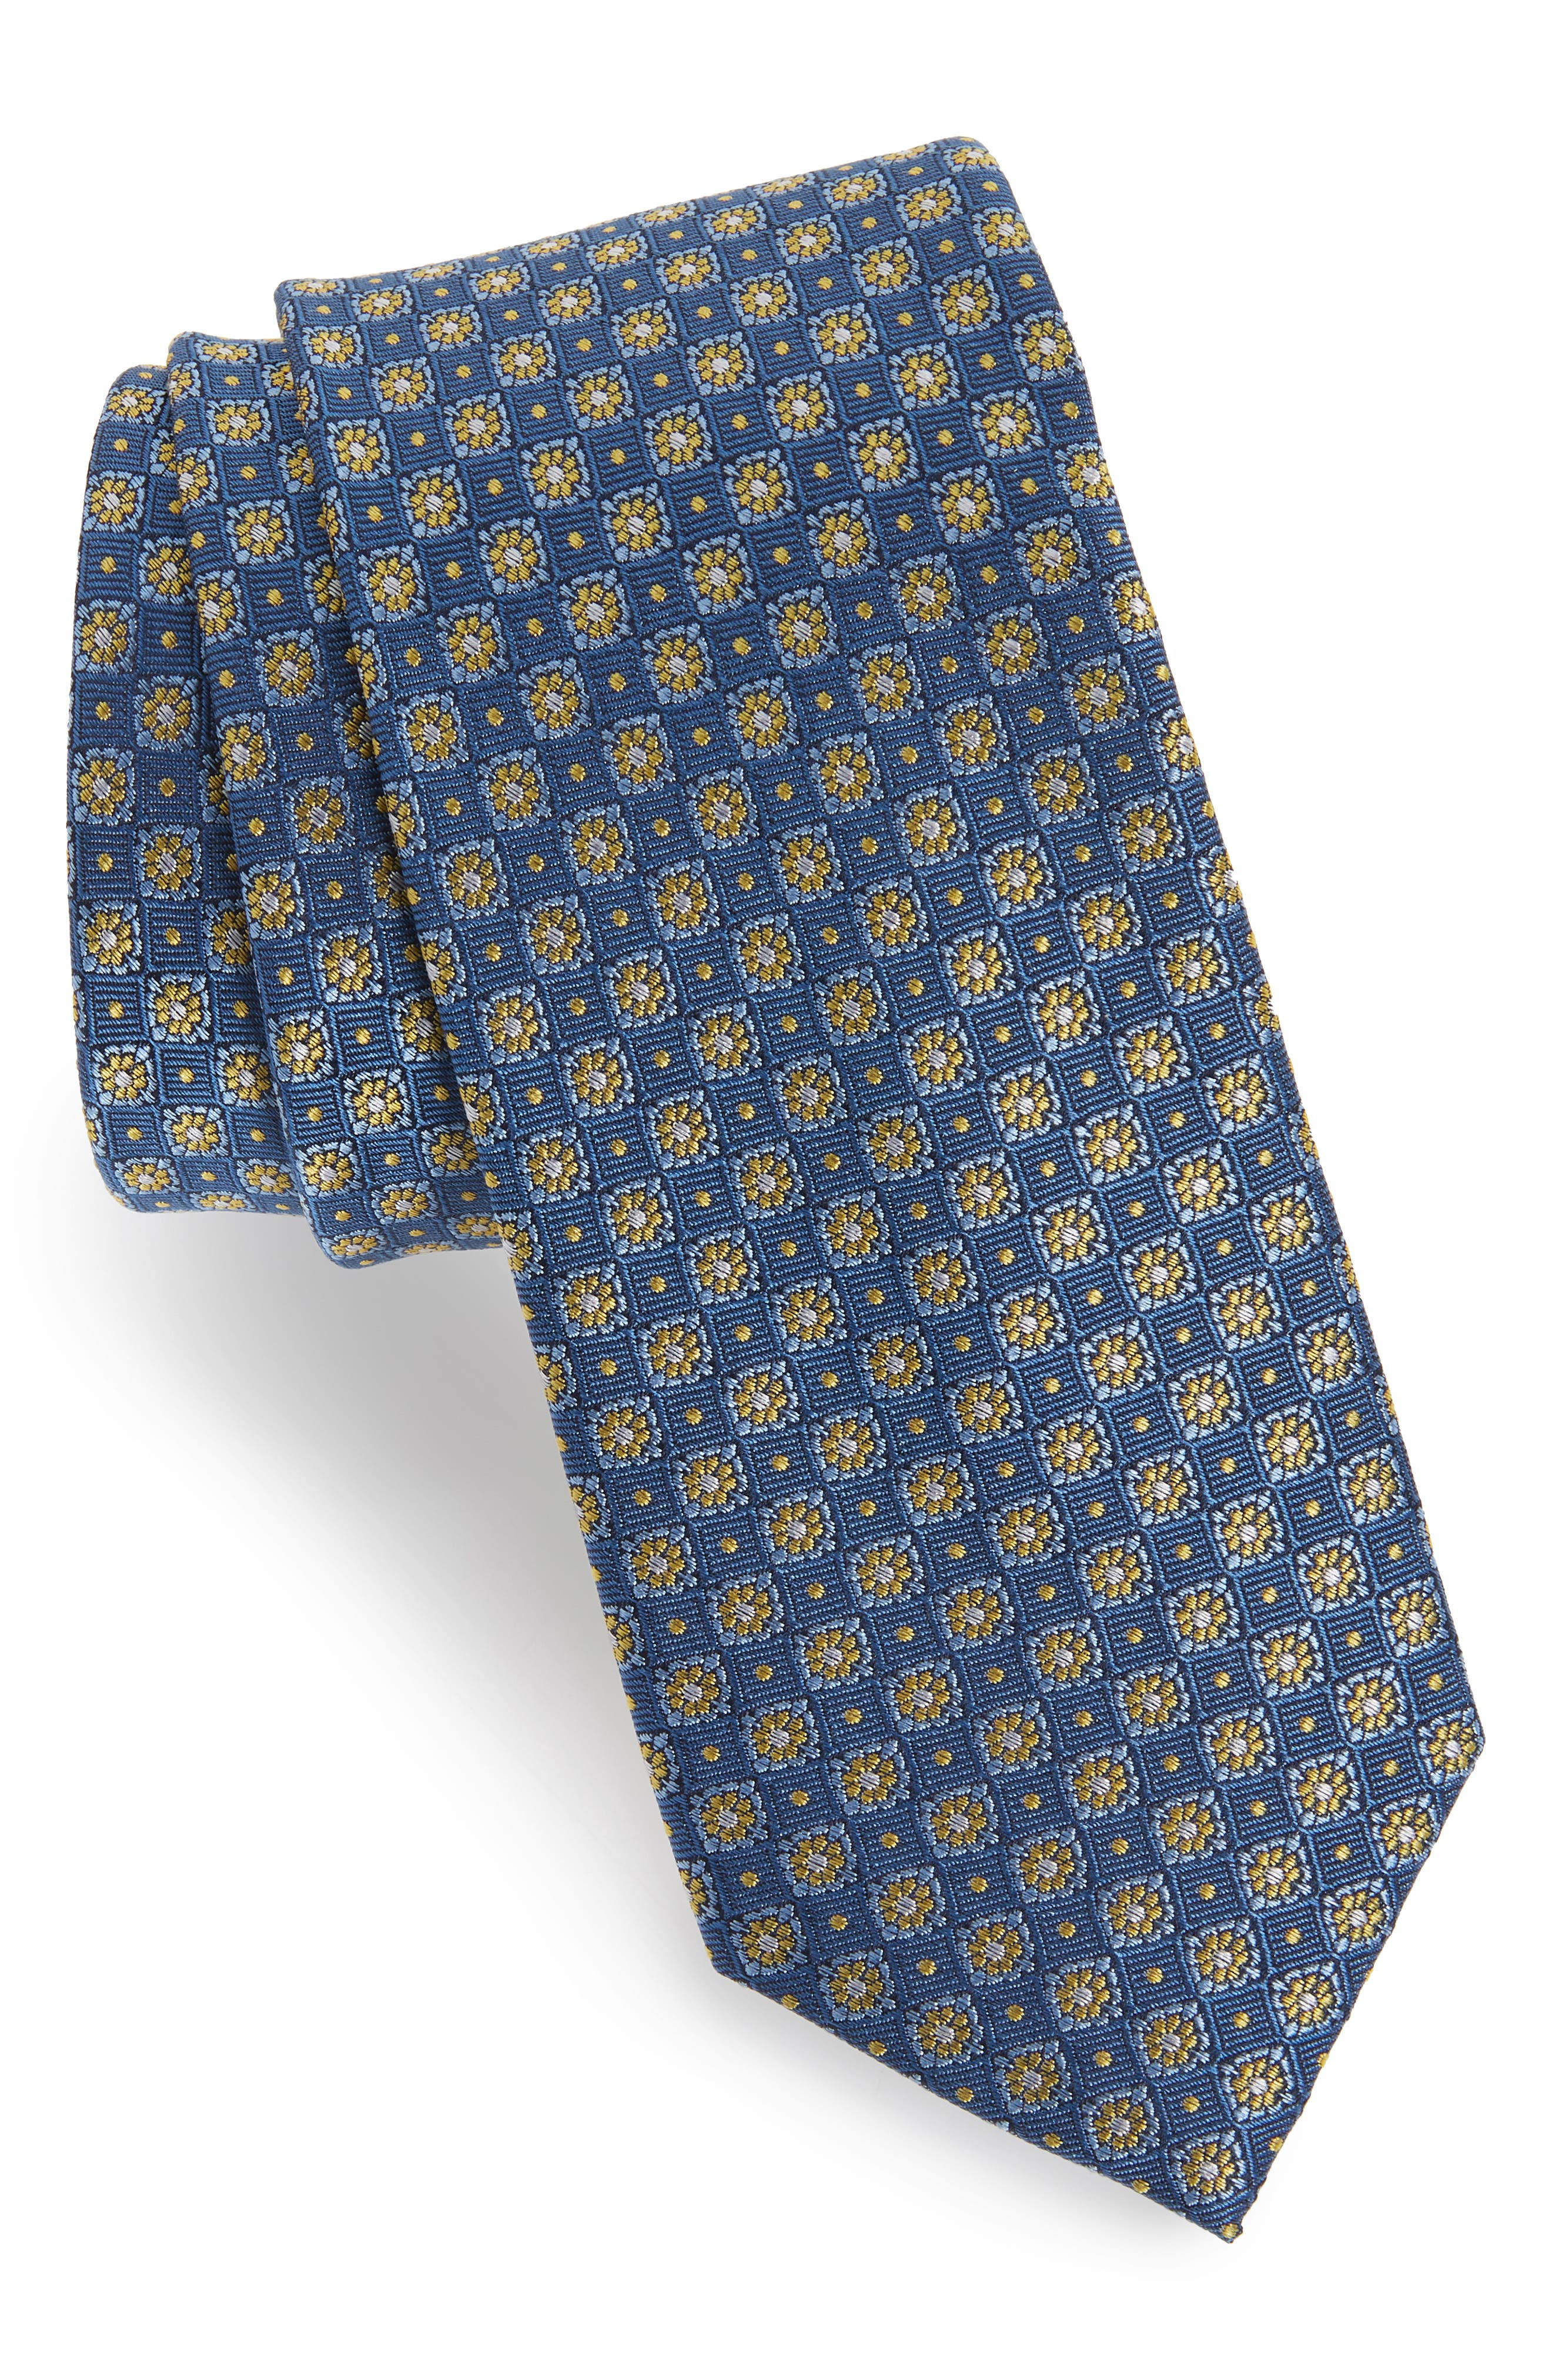 Homme Medallion Silk Tie,                         Main,                         color, BLUE